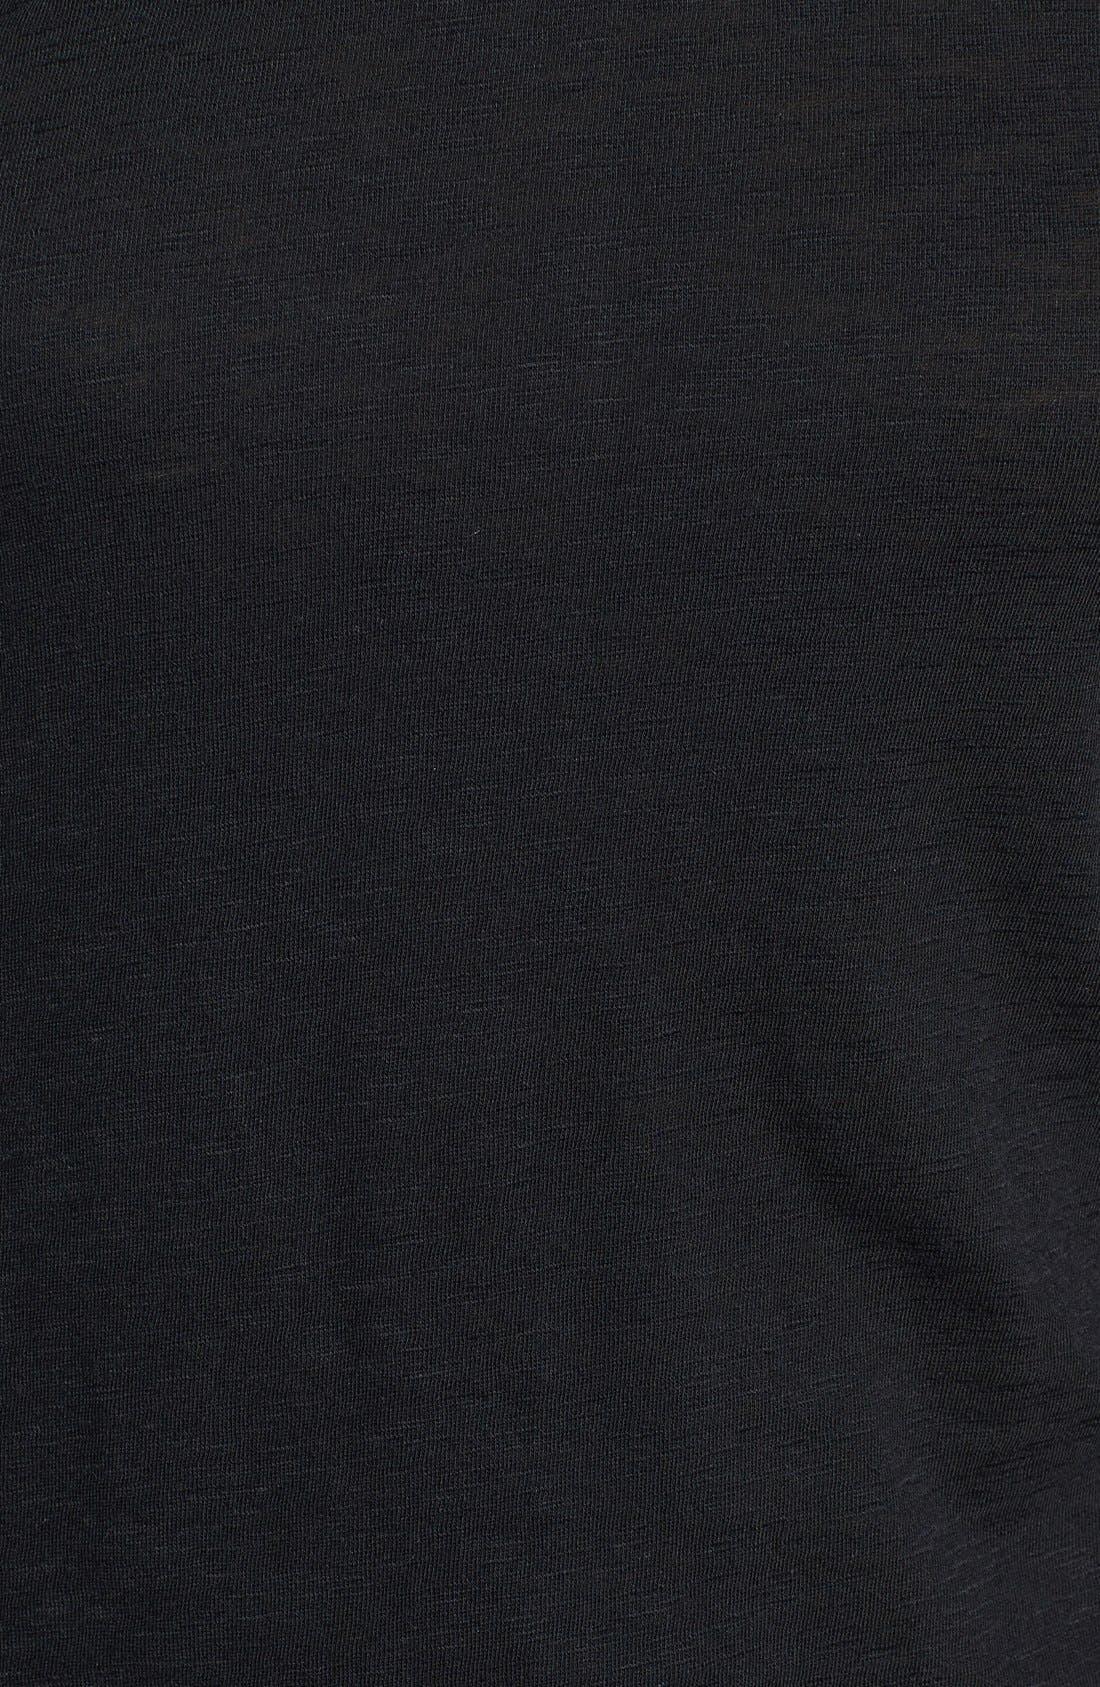 Long Sleeve Crewneck Tee,                             Alternate thumbnail 12, color,                             BLACK